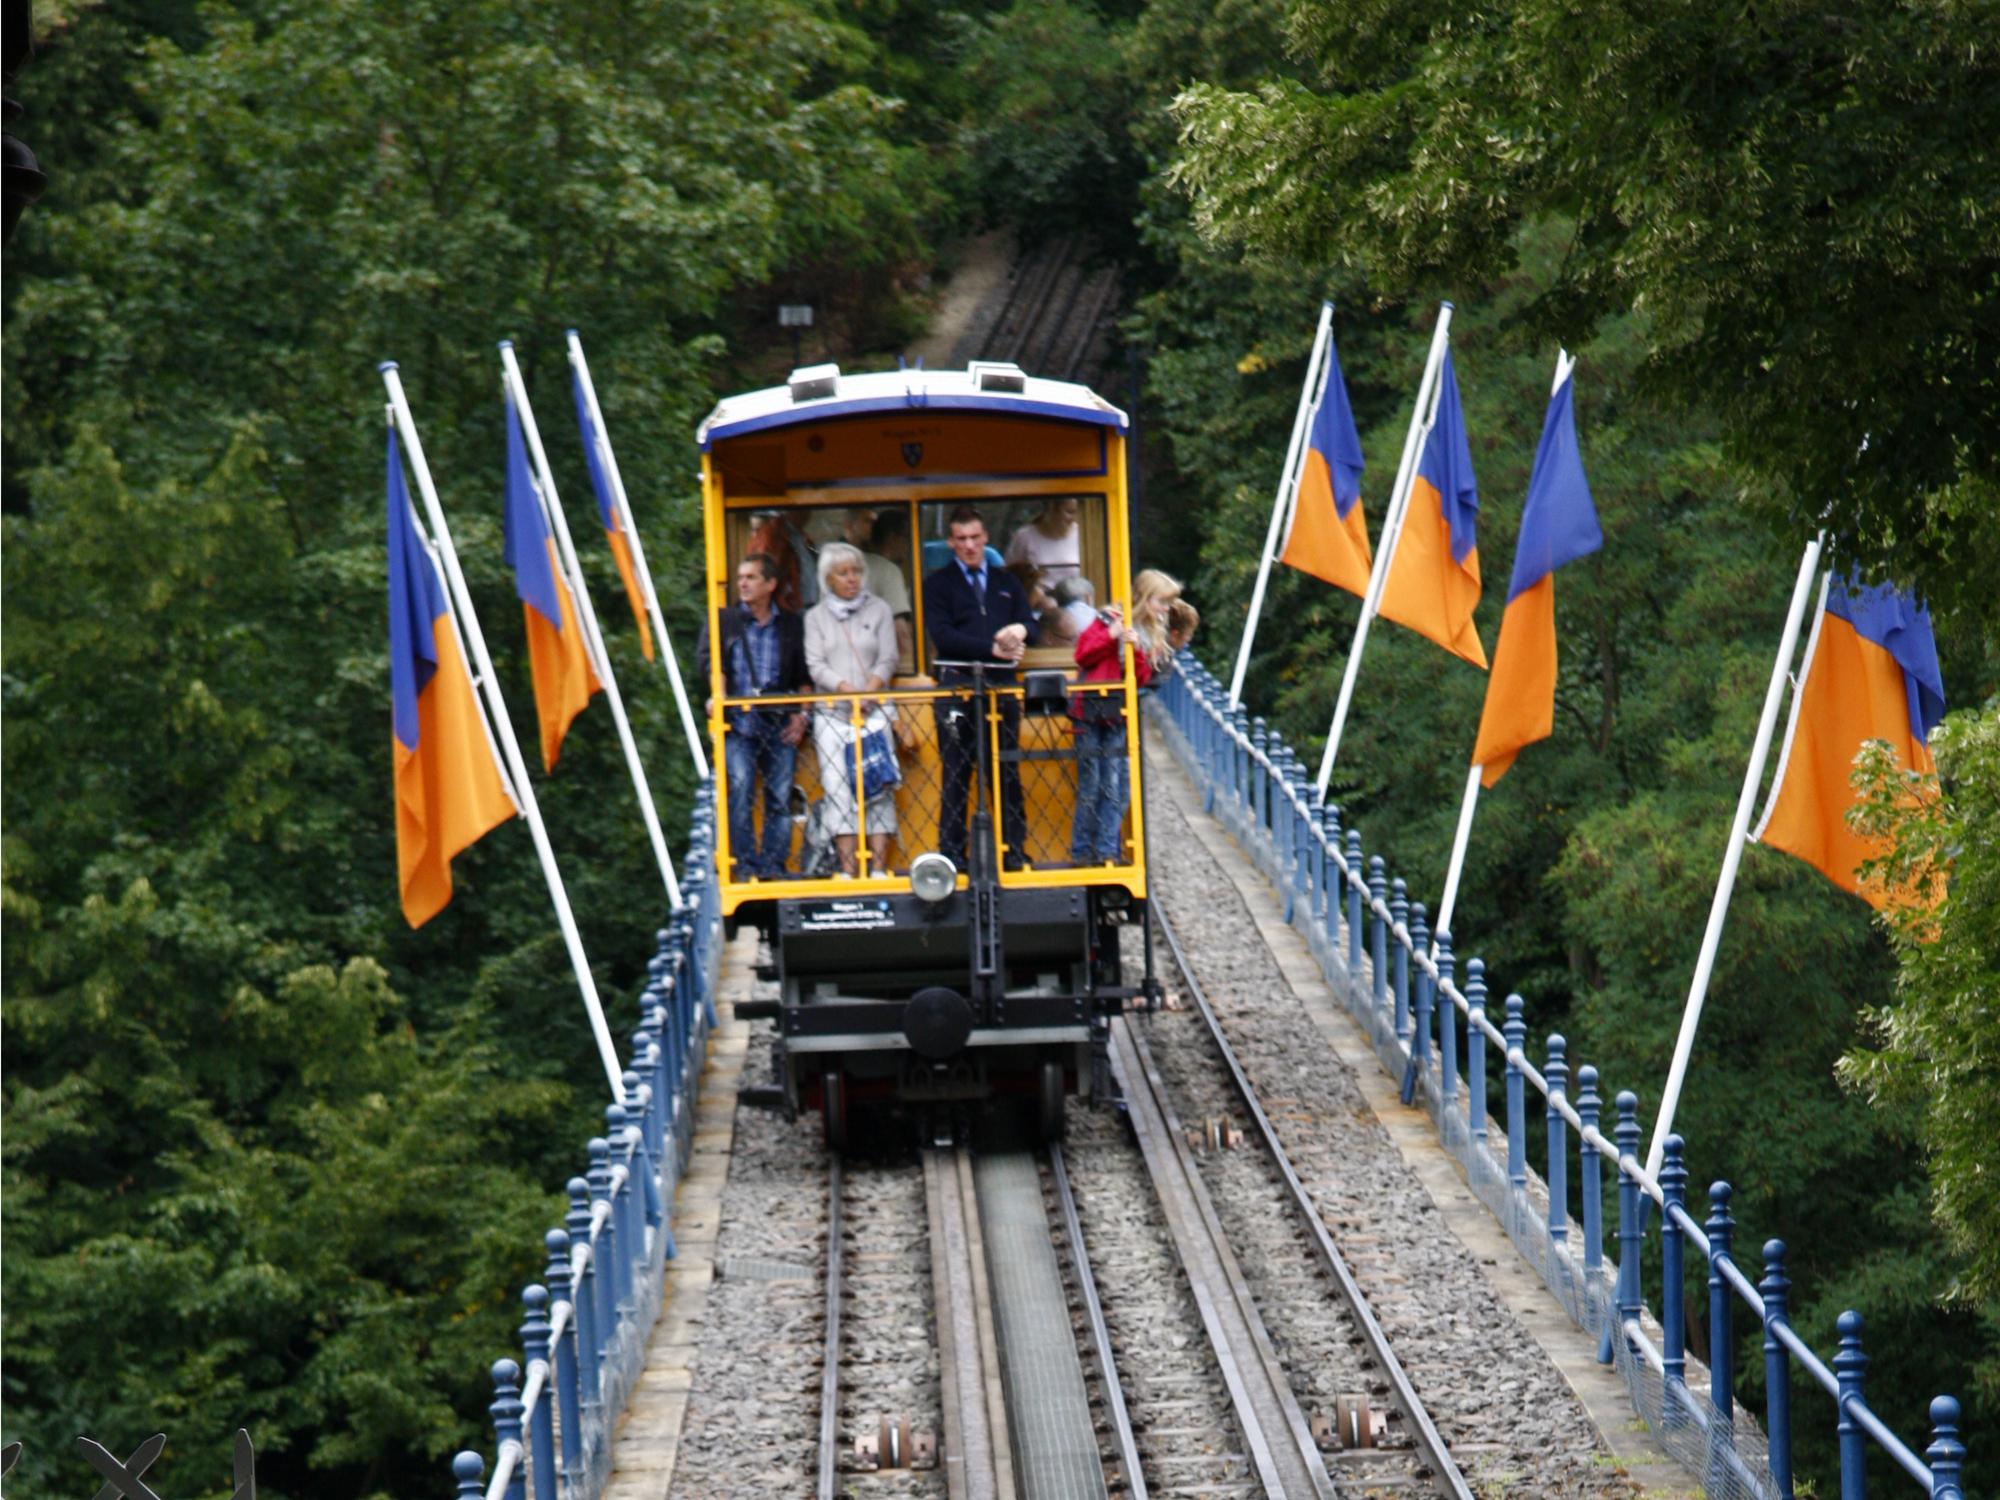 Nerobergbahn Mountain Train